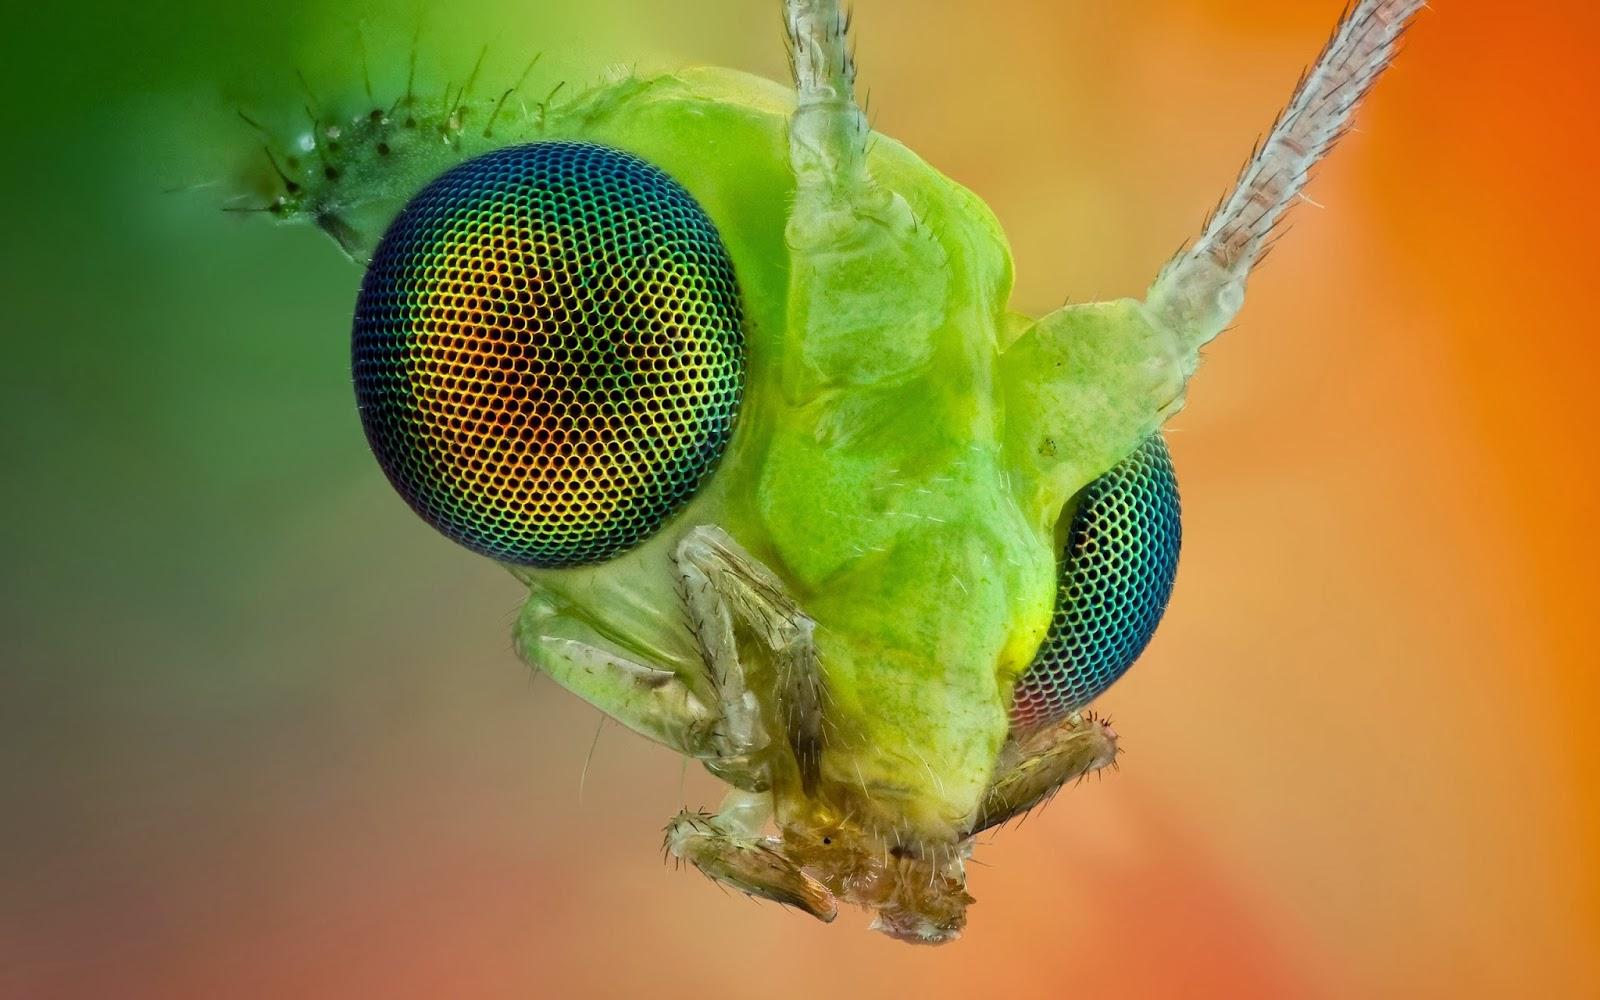 HD Wallpapers Desktop: Insects HD Wallpaperas